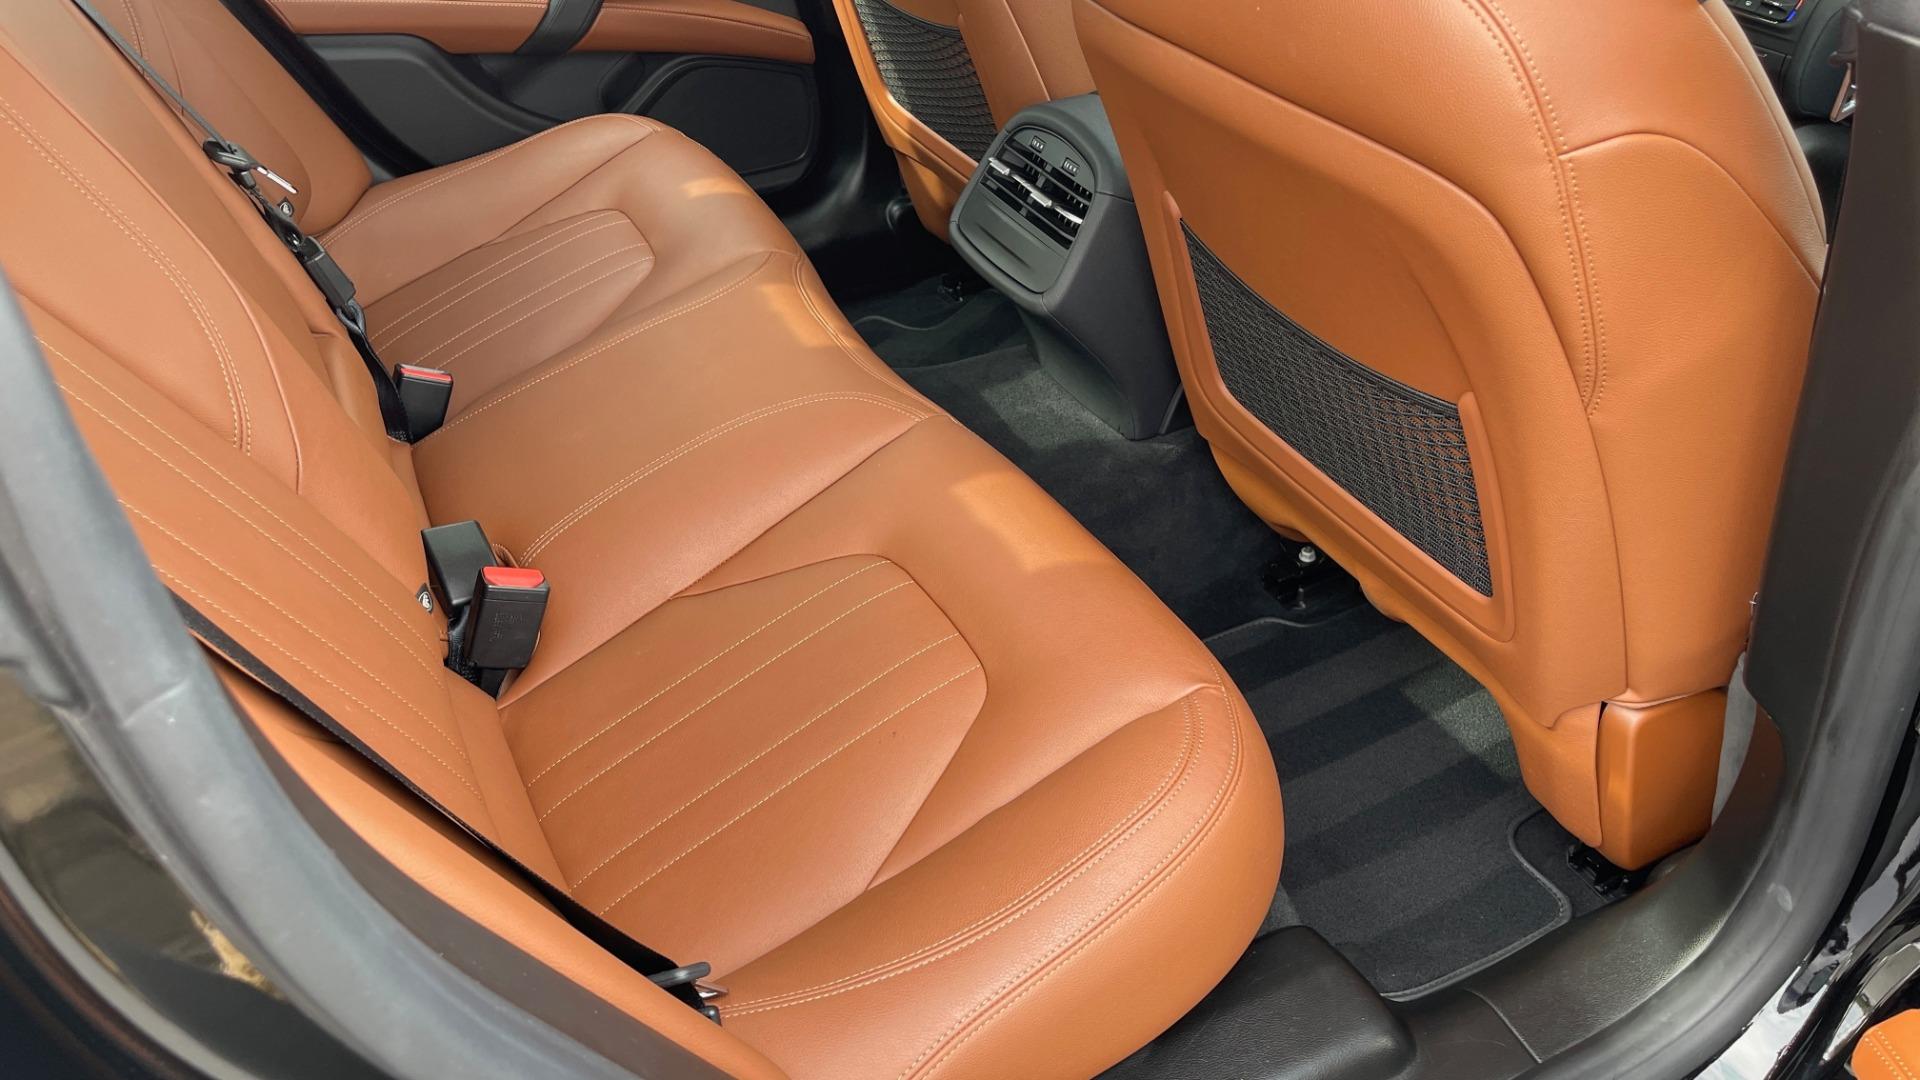 Used 2018 Maserati GHIBLI 3.0L SEDAN / 8-SPD AUTO / NAV / SUNROOF / REARVIEW for sale $42,995 at Formula Imports in Charlotte NC 28227 55